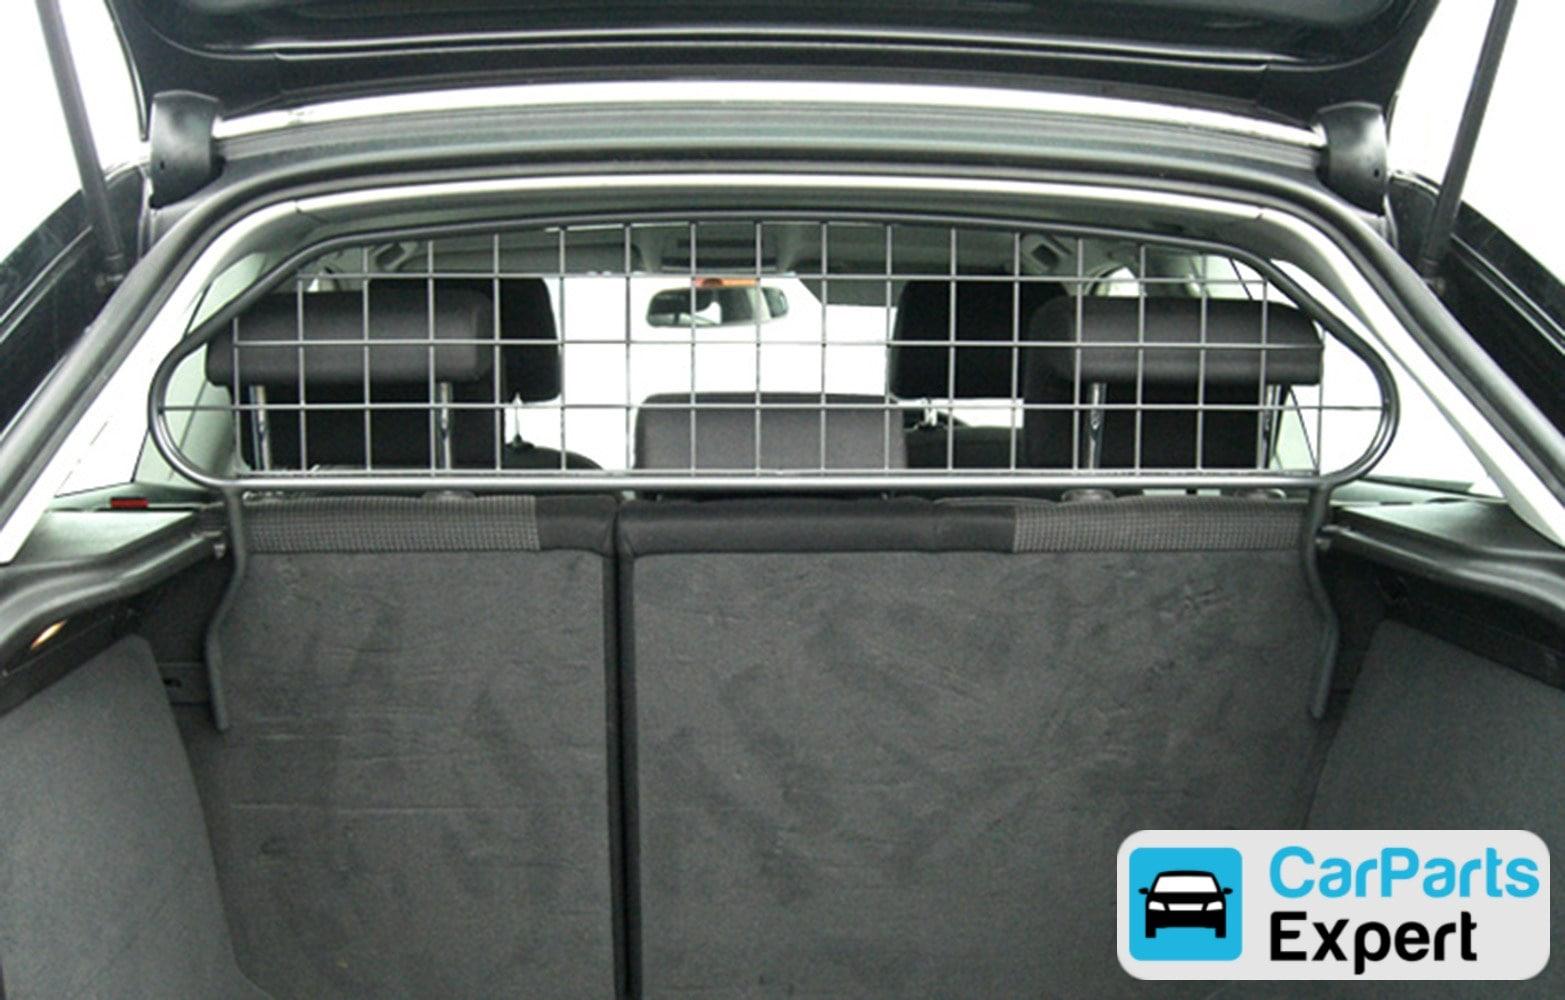 Audi a3 8p 2003 2012 3 door dog guard hundegitter